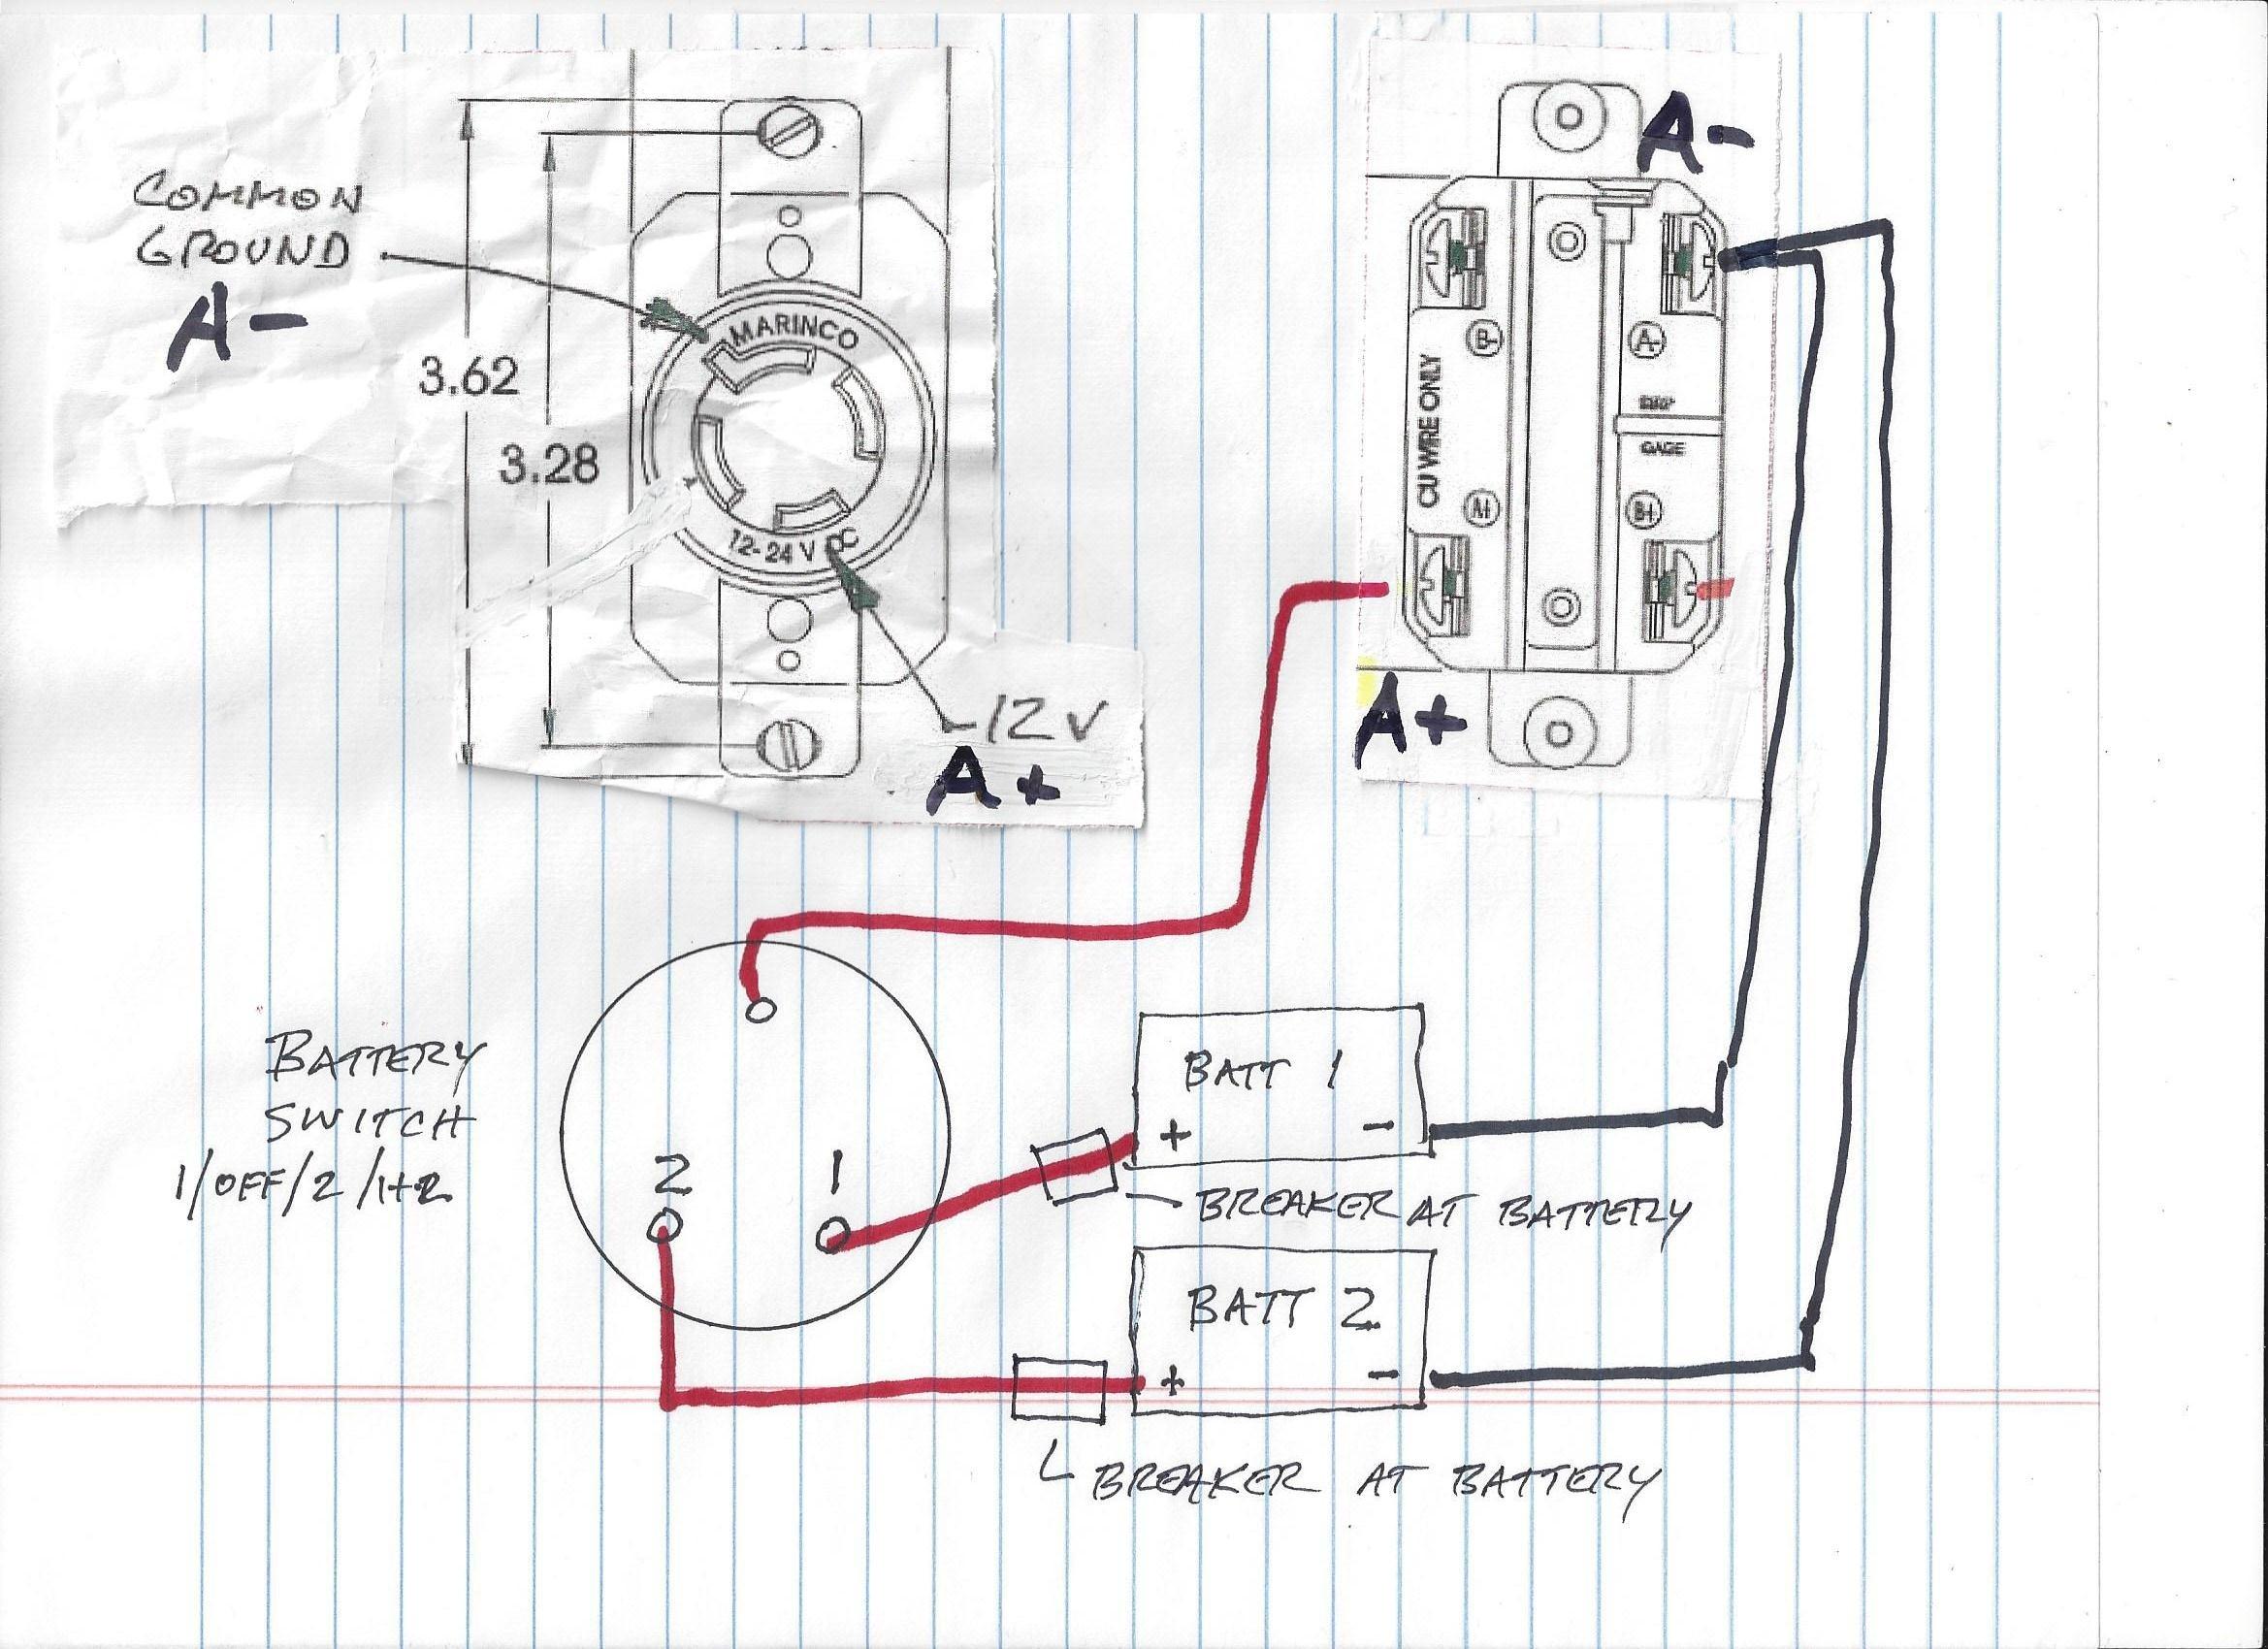 36 volt battery wiring diagram trolling motor